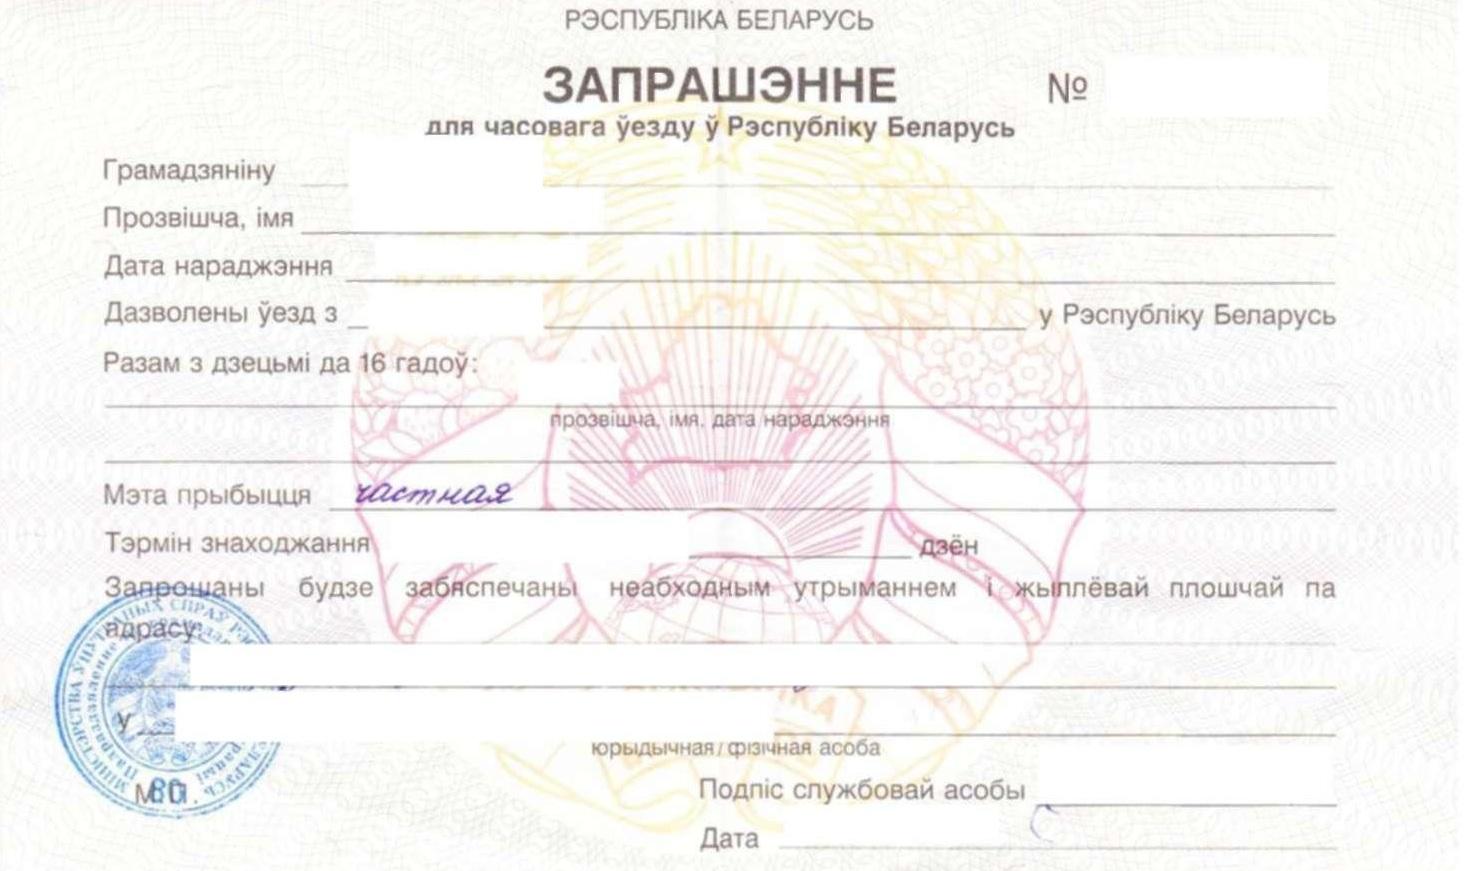 Trip from Sofia Bulgaria to Minsk Belarus through Warsaw ...